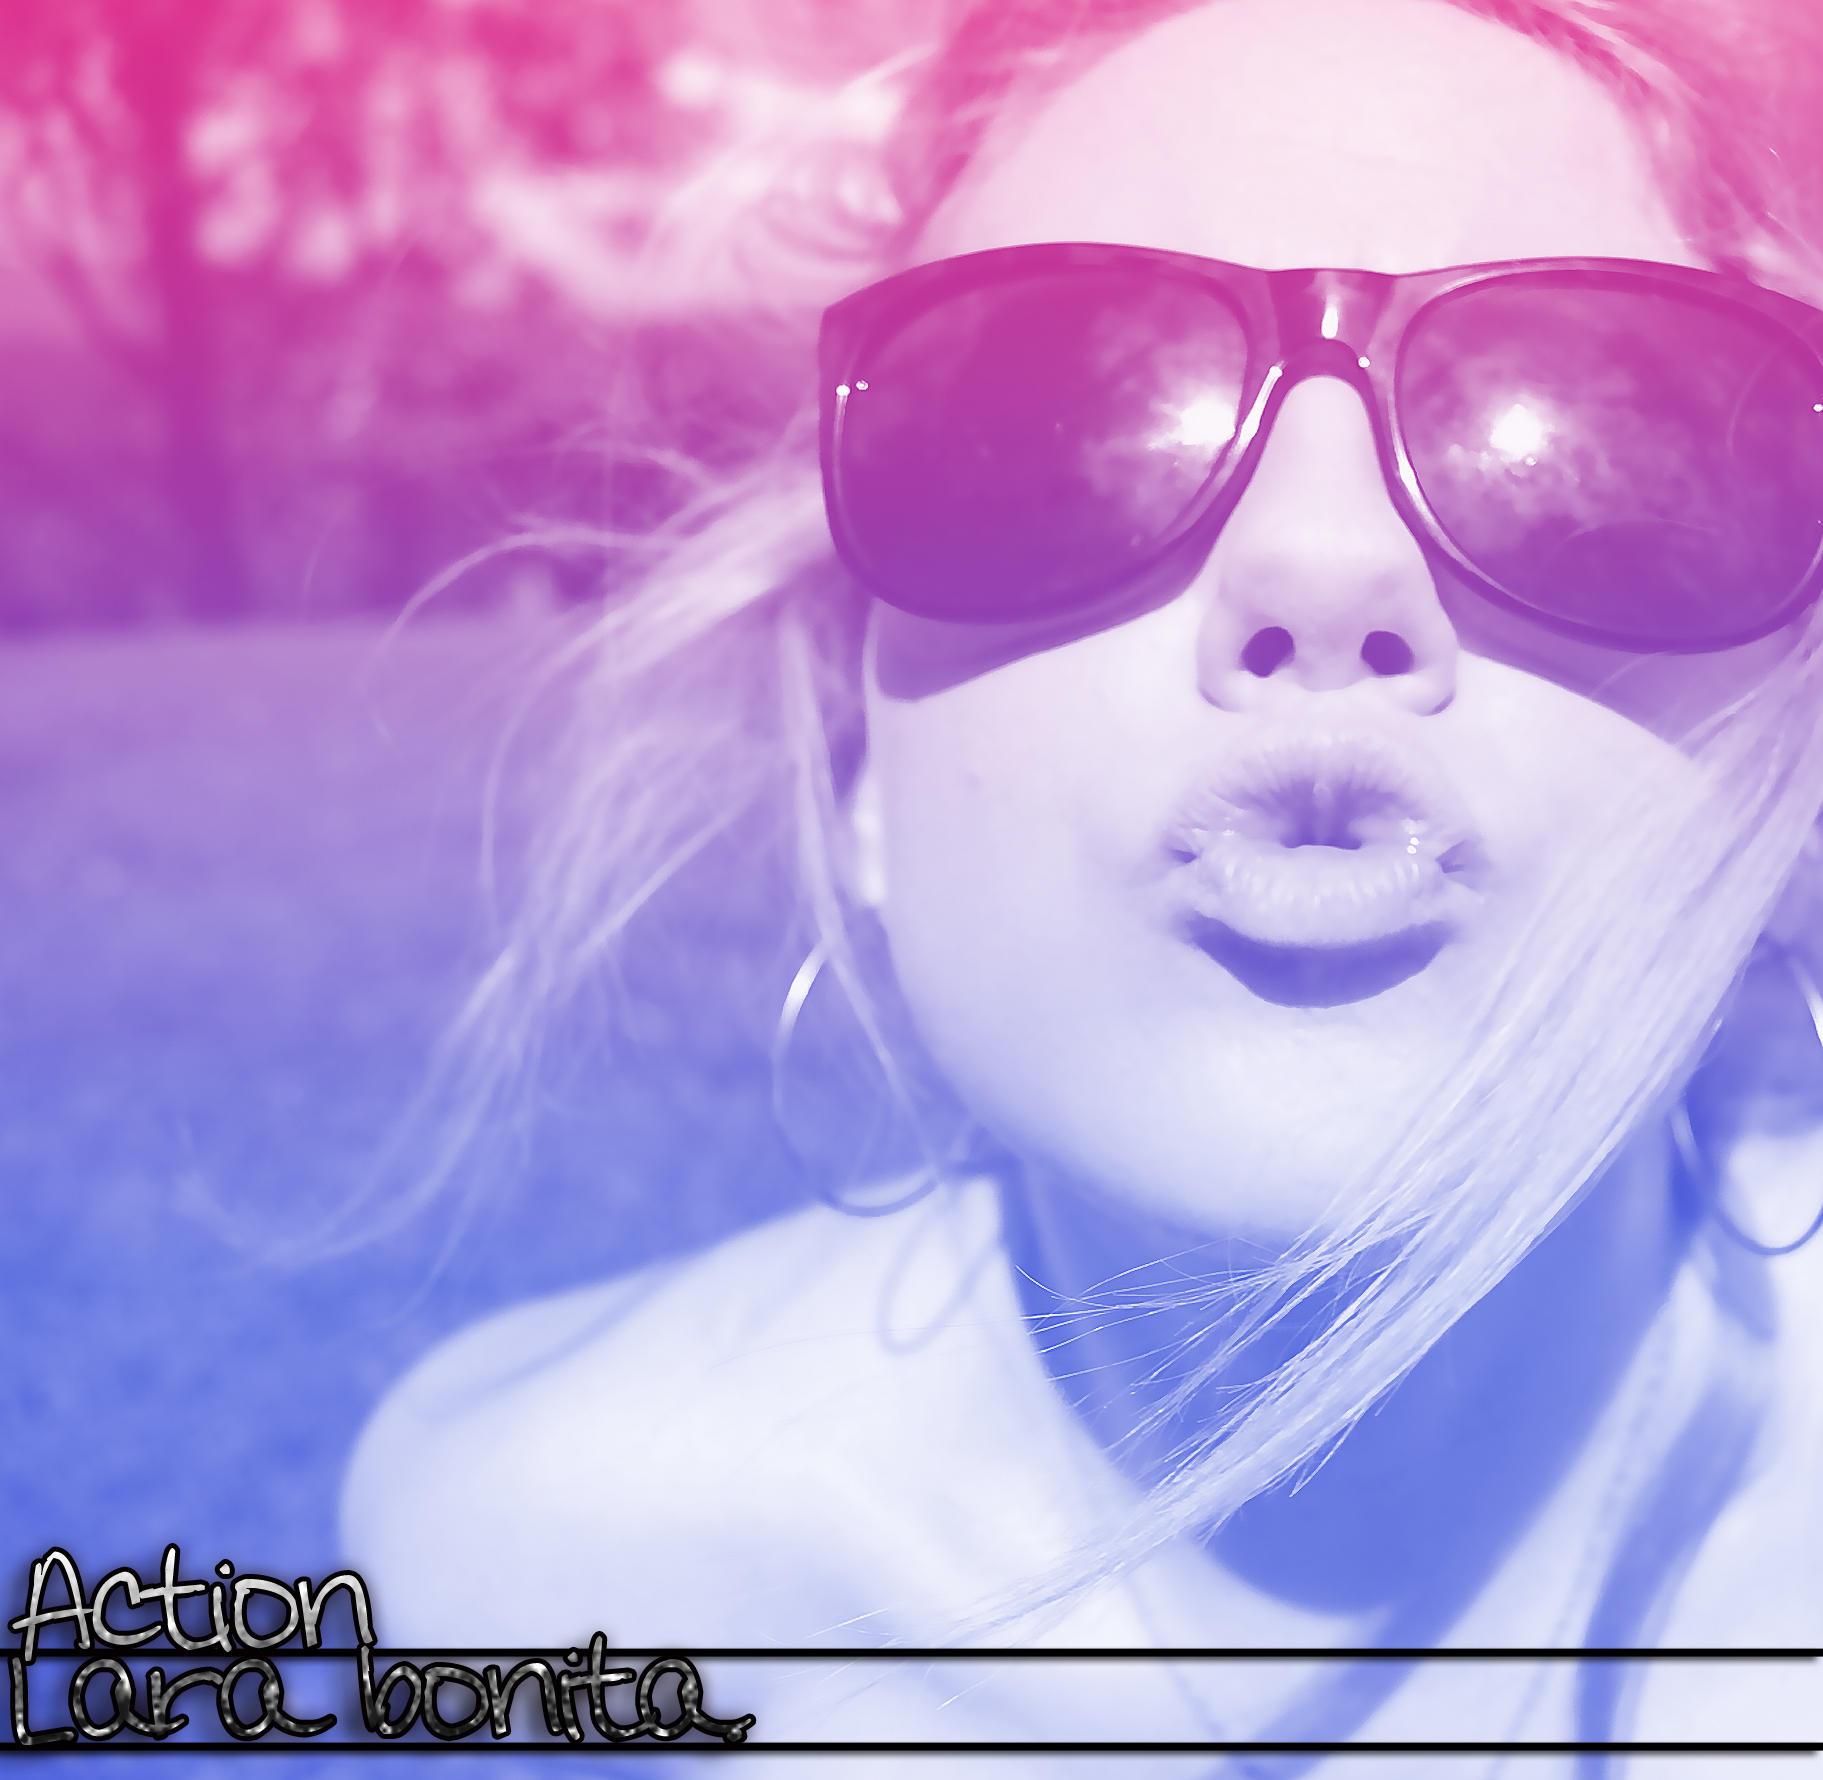 Action Lara Bonita. by DontTouchMeBitch